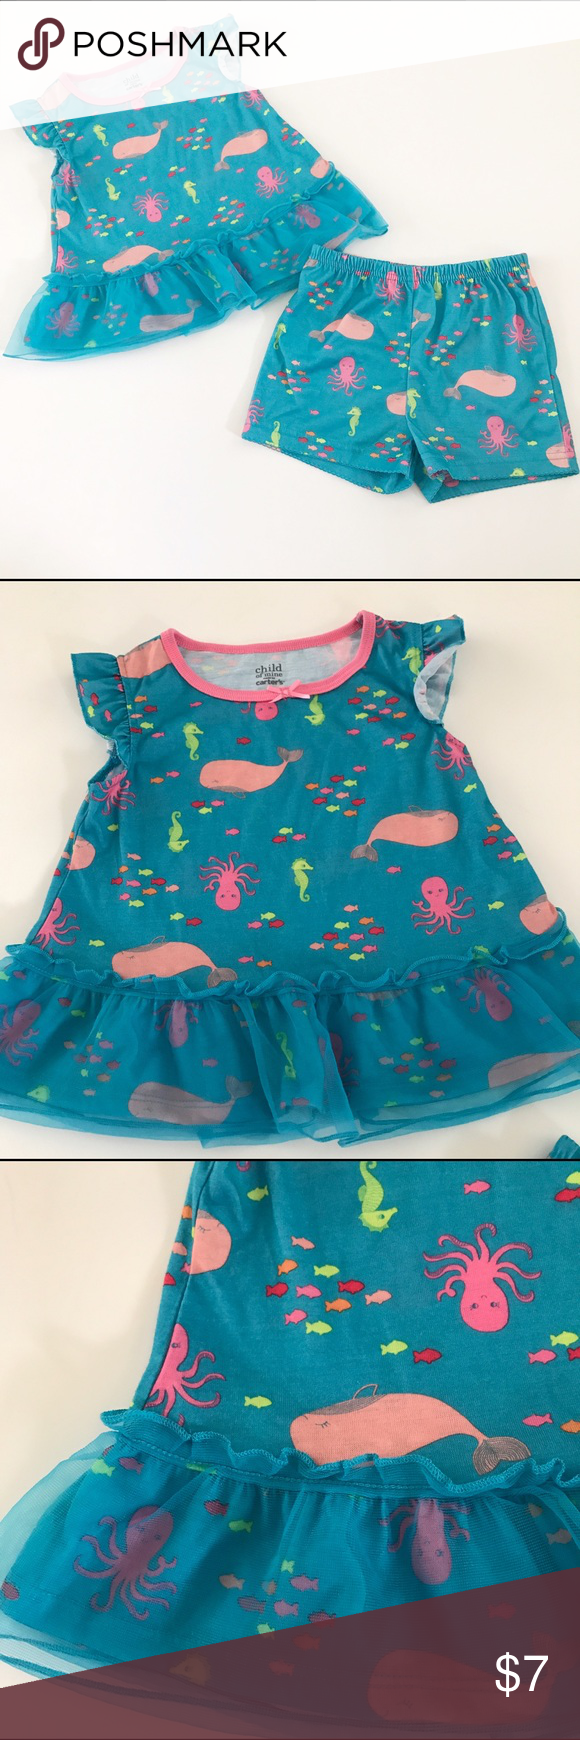 221551e83d7c Child of Mine by Carters blue sea creature pajamas